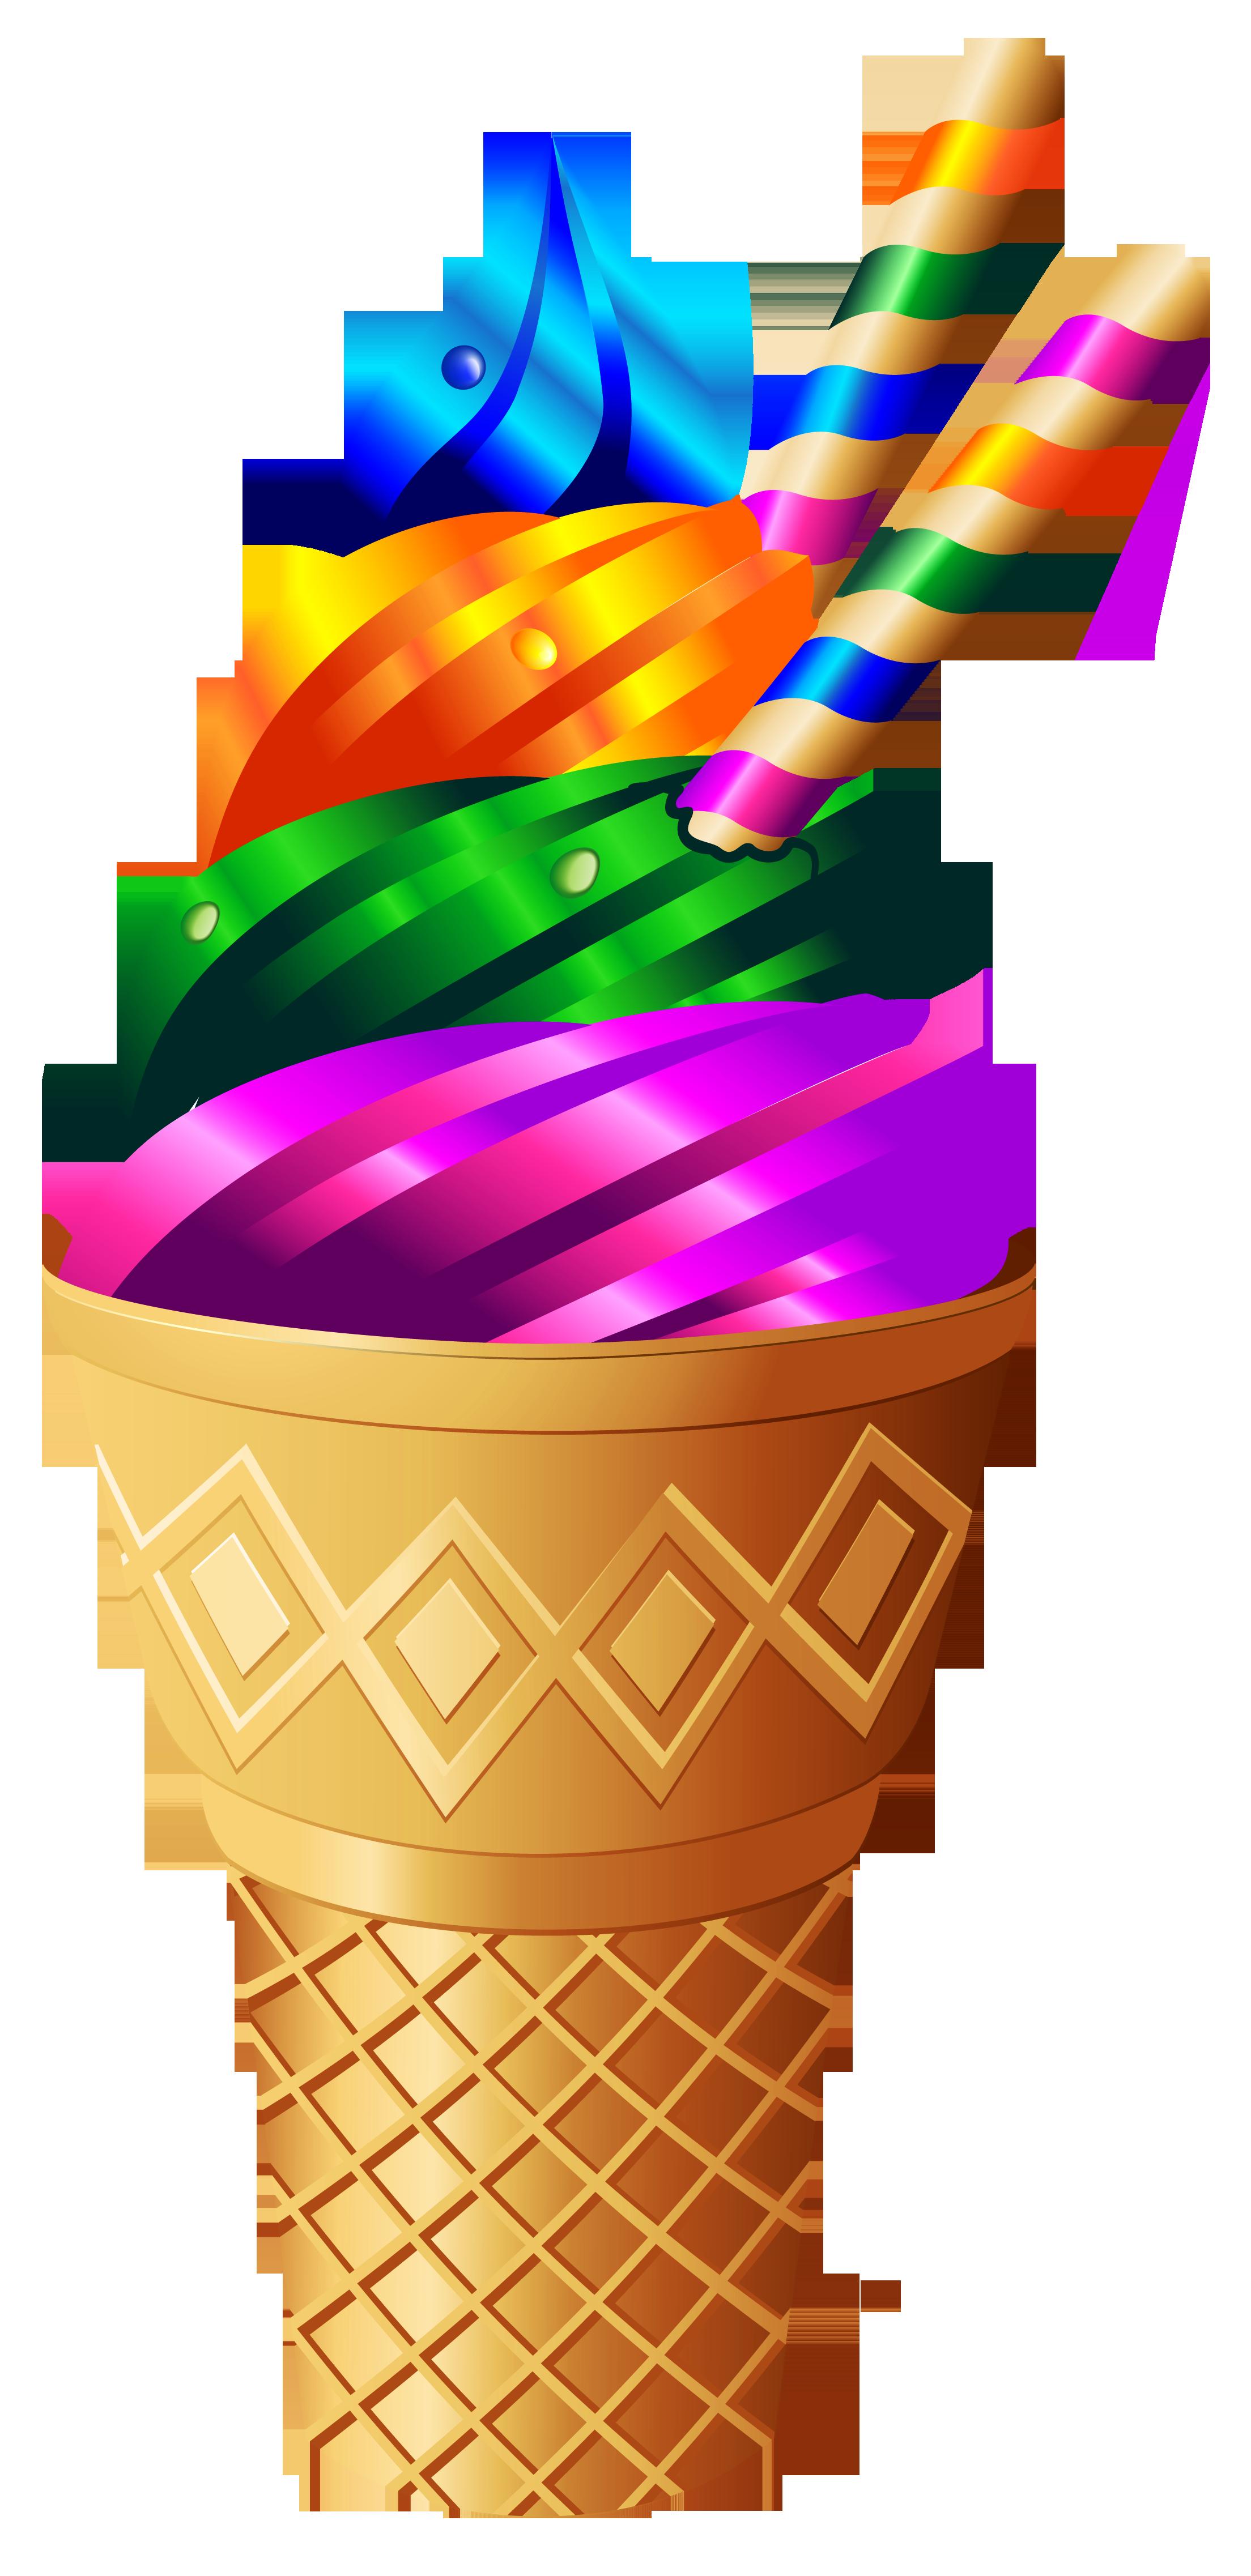 Transparent Rainbow Ice Cream Png Image Rainbow Ice Cream Ice Cream Art Ice Cream Clipart